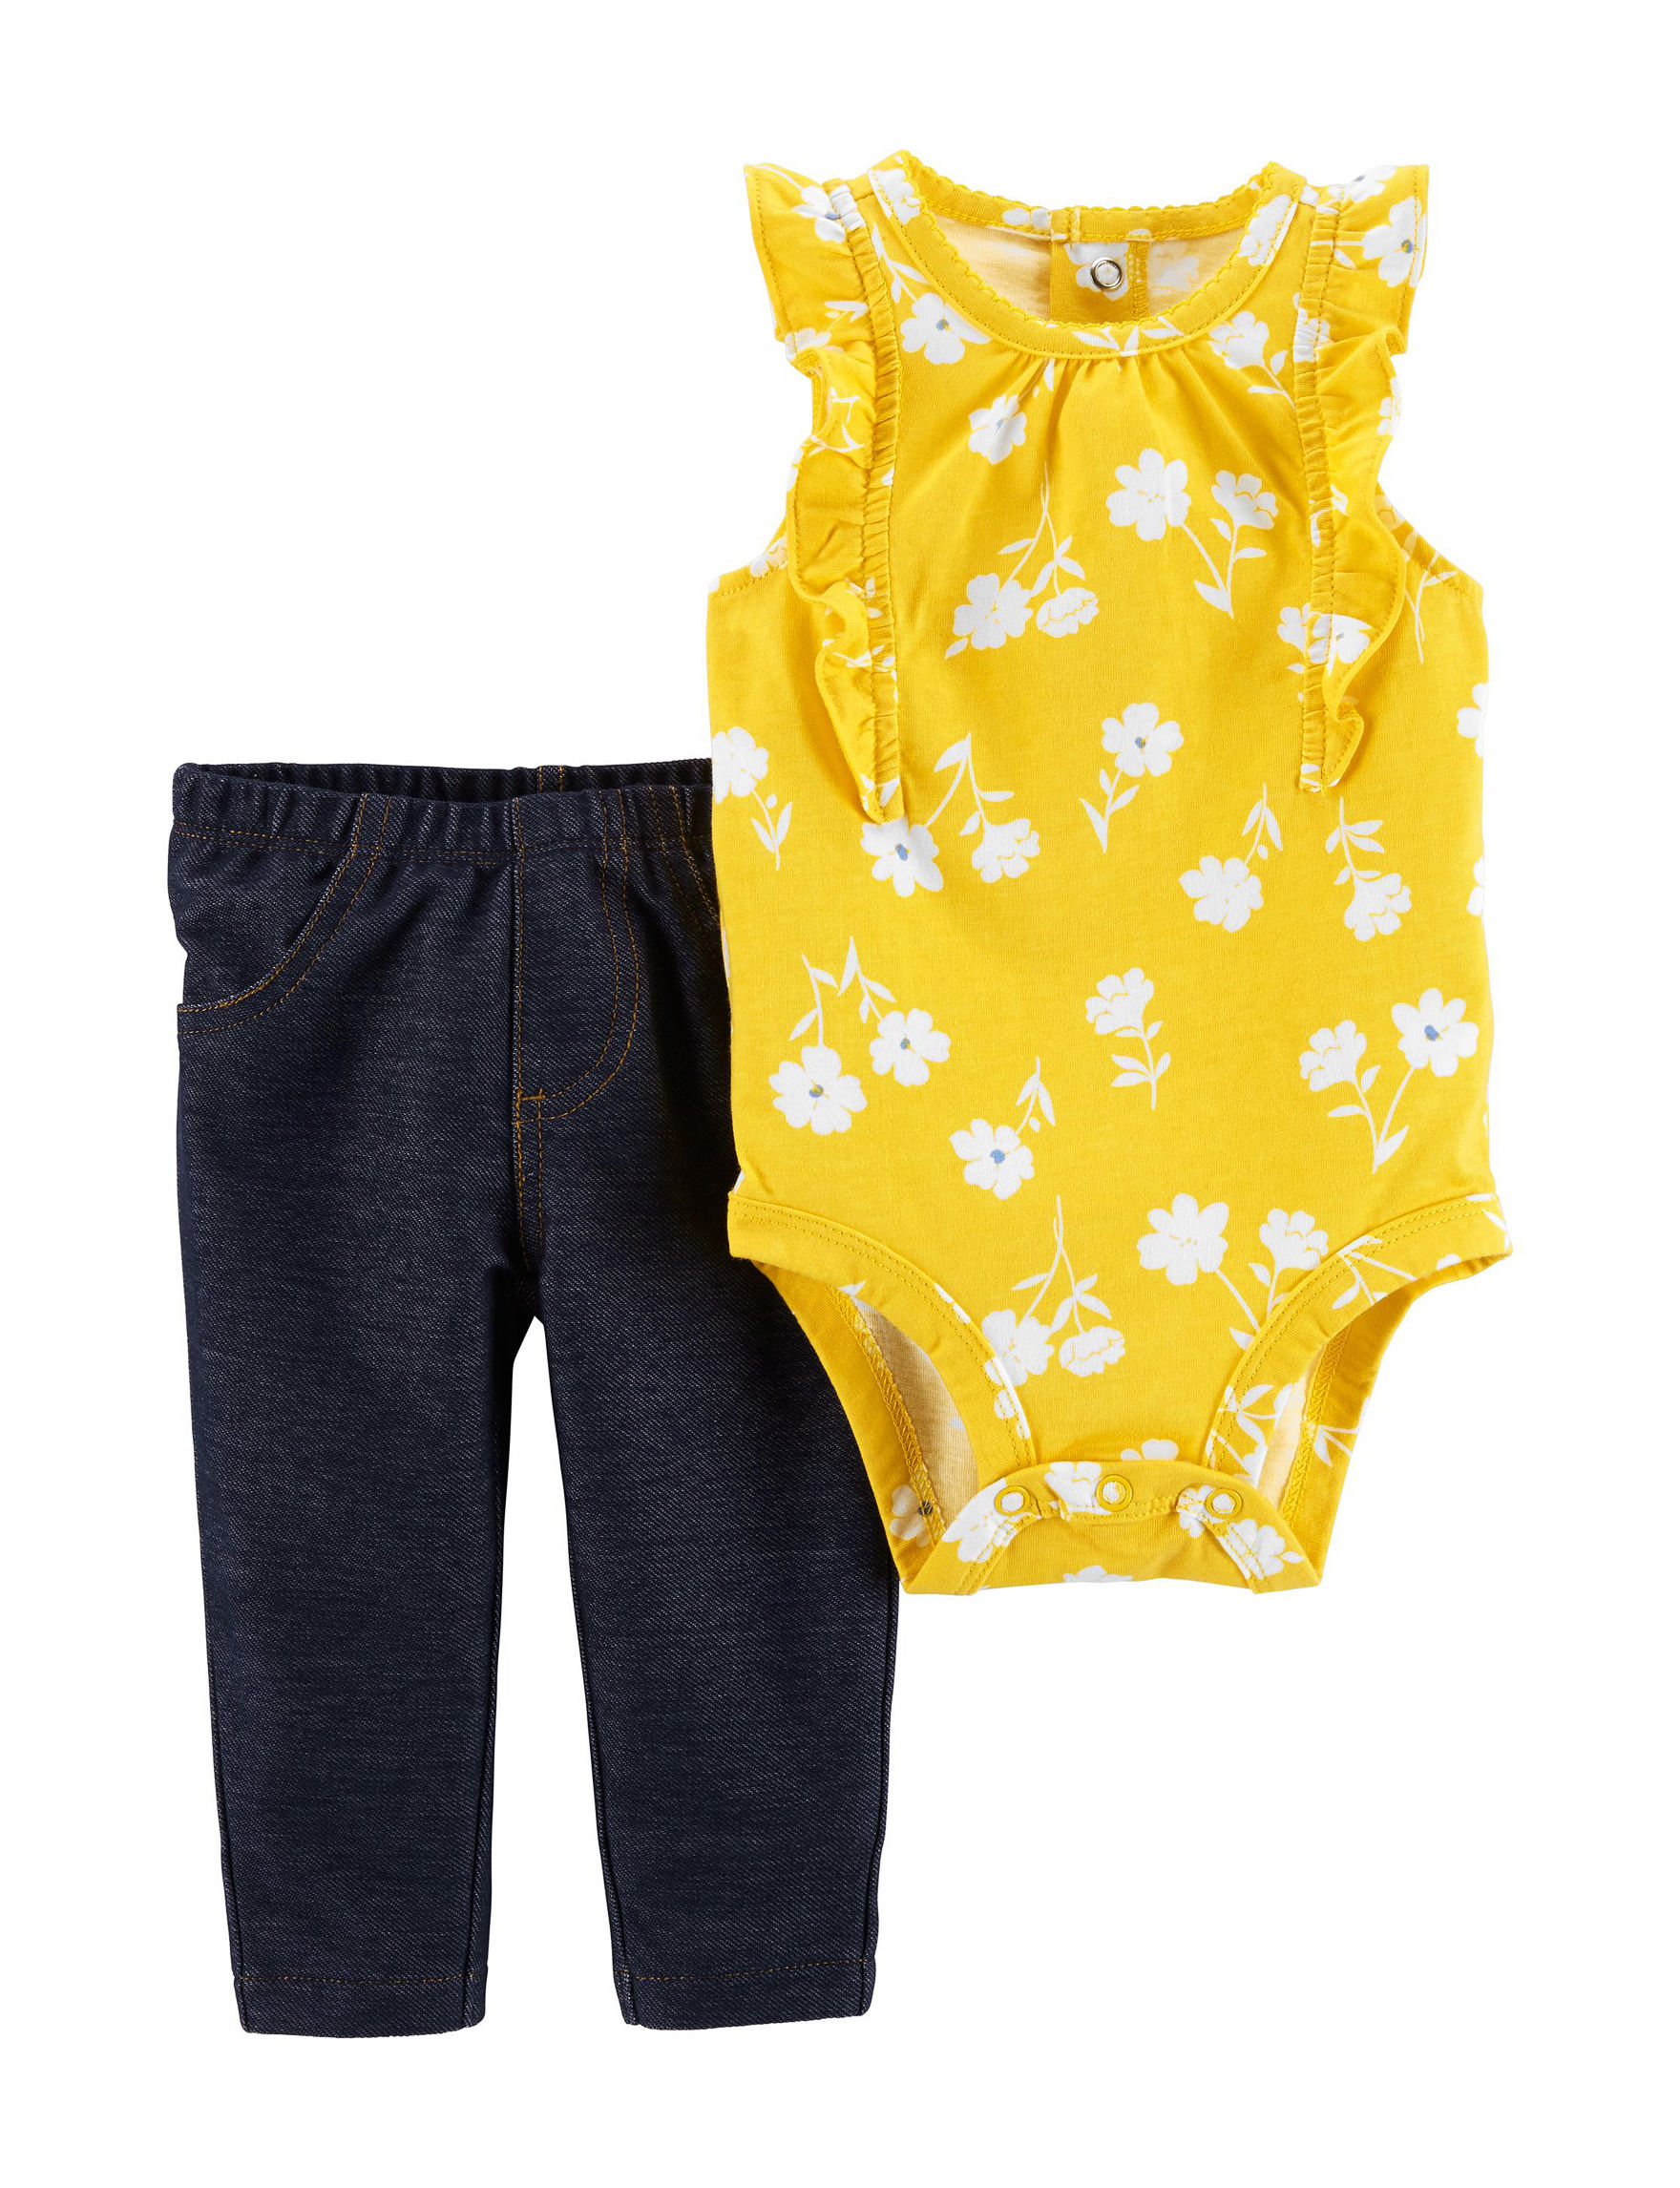 Carter's Yellow / Blue